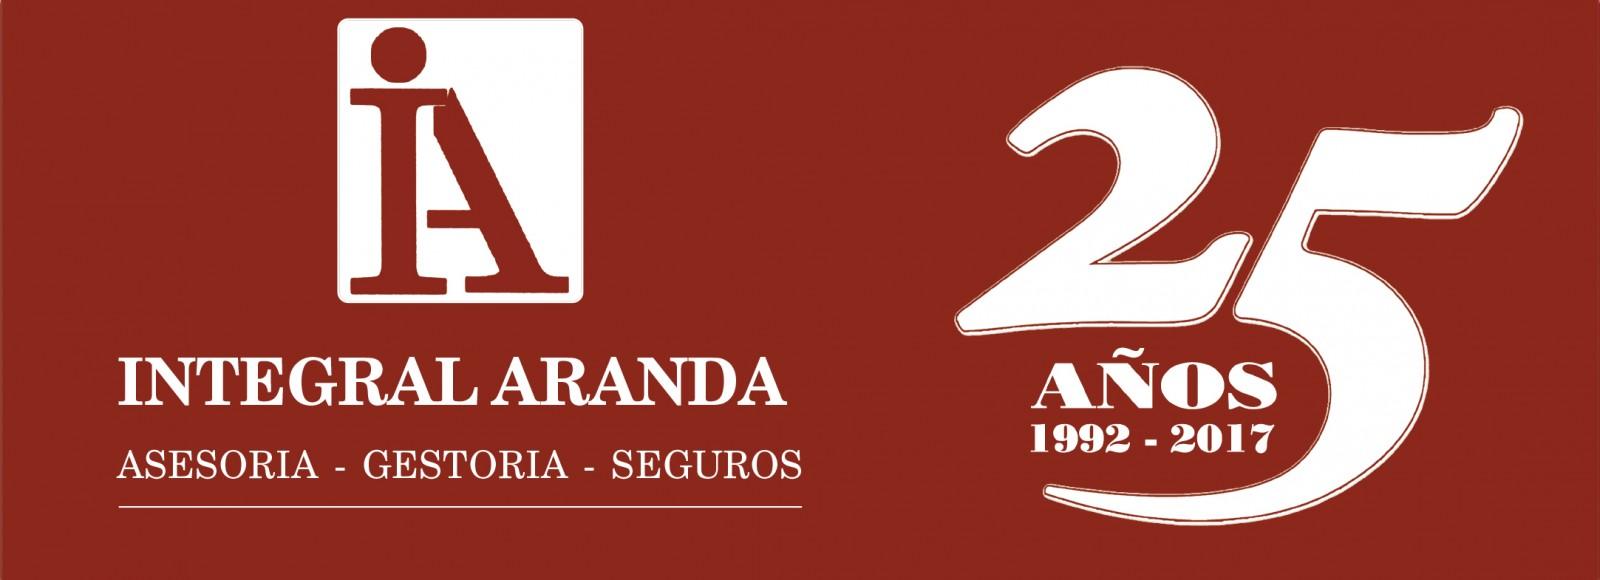 25 Aniversario Integral Aranda